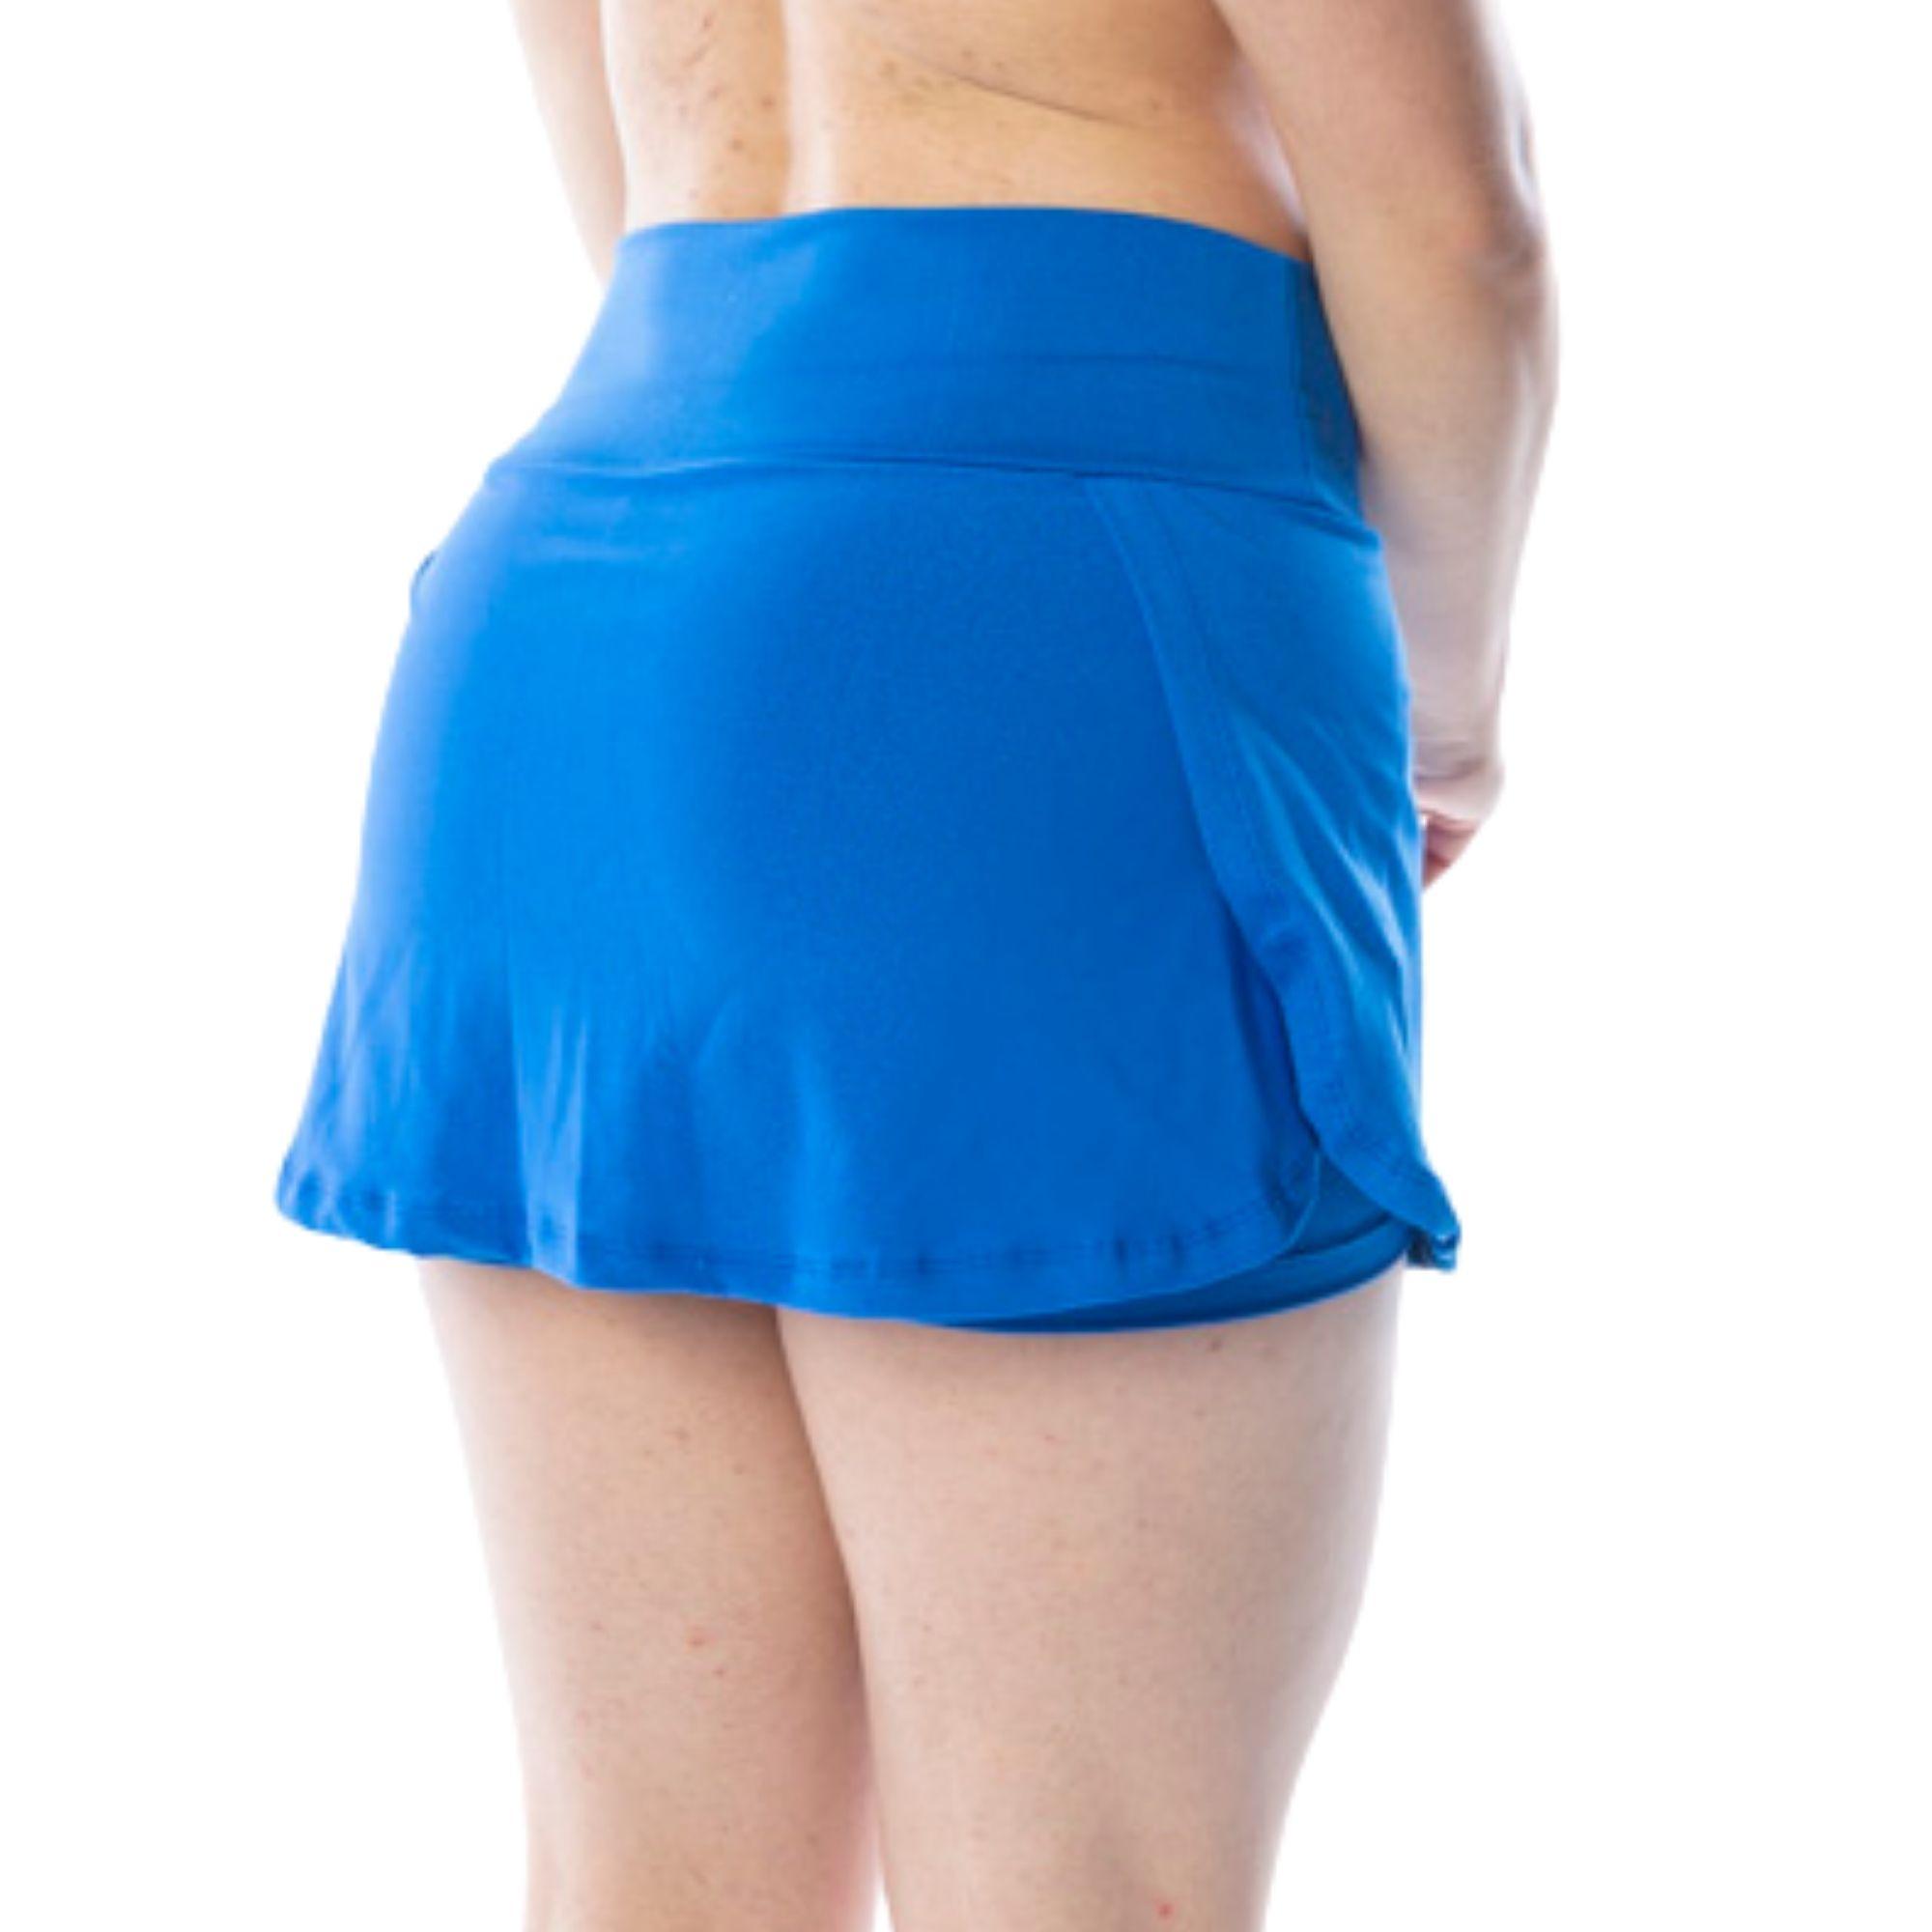 Short Saia Fitness Azul Royal